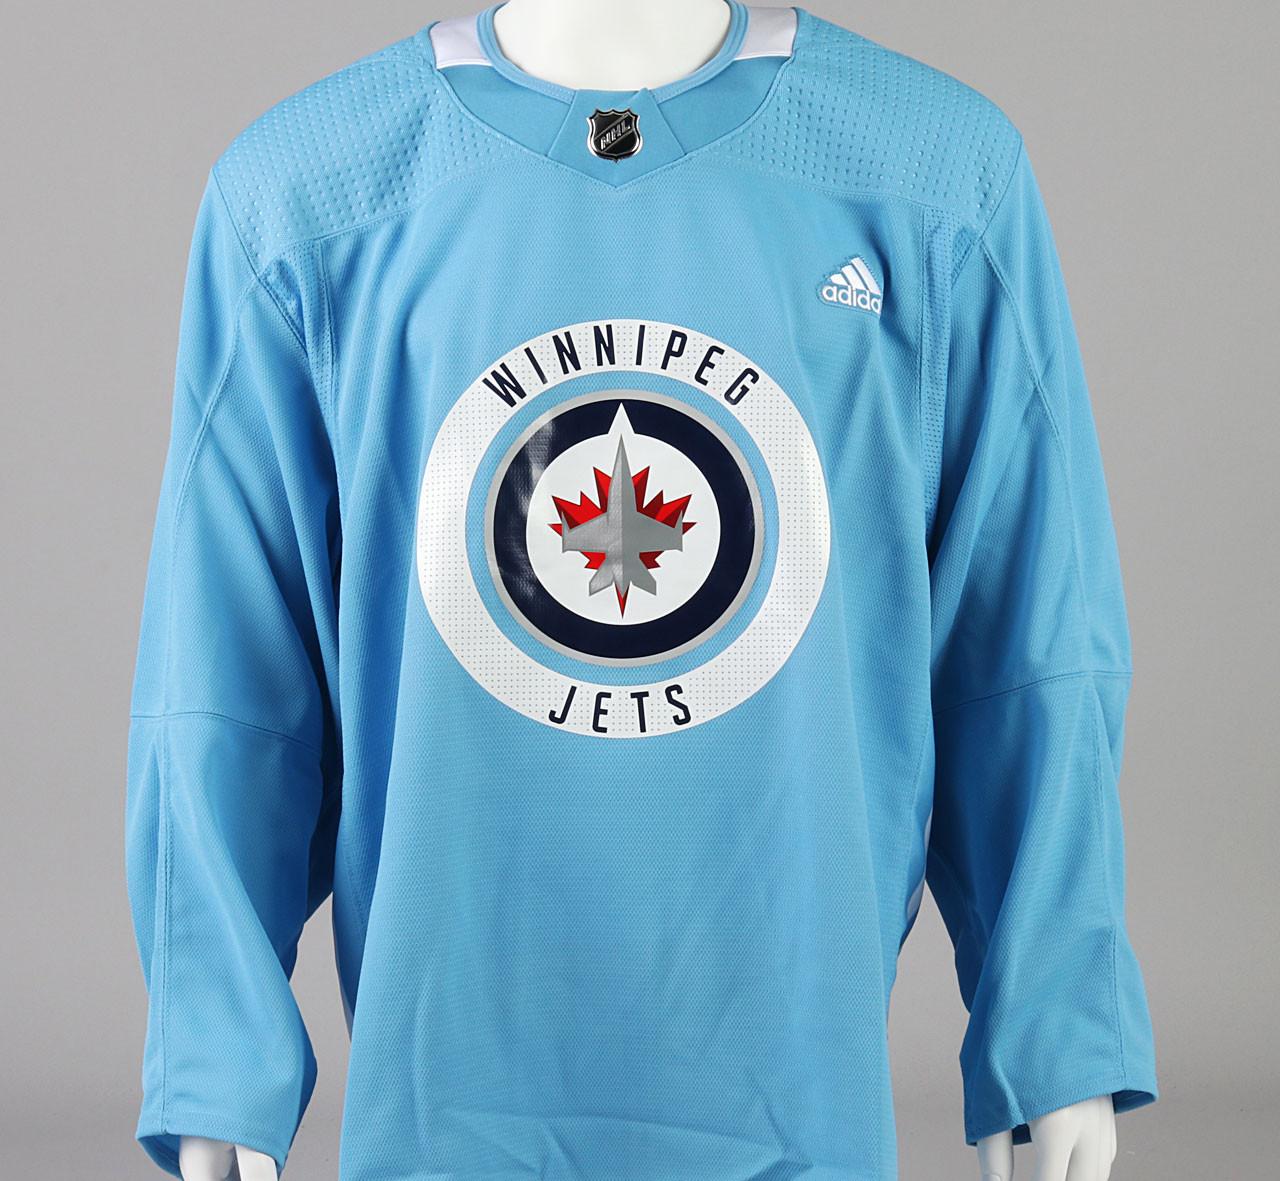 a4c8370e425 Practice Jersey - Winnipeg Jets - Baby Blue Adidas Size 56 #2 - Pro ...